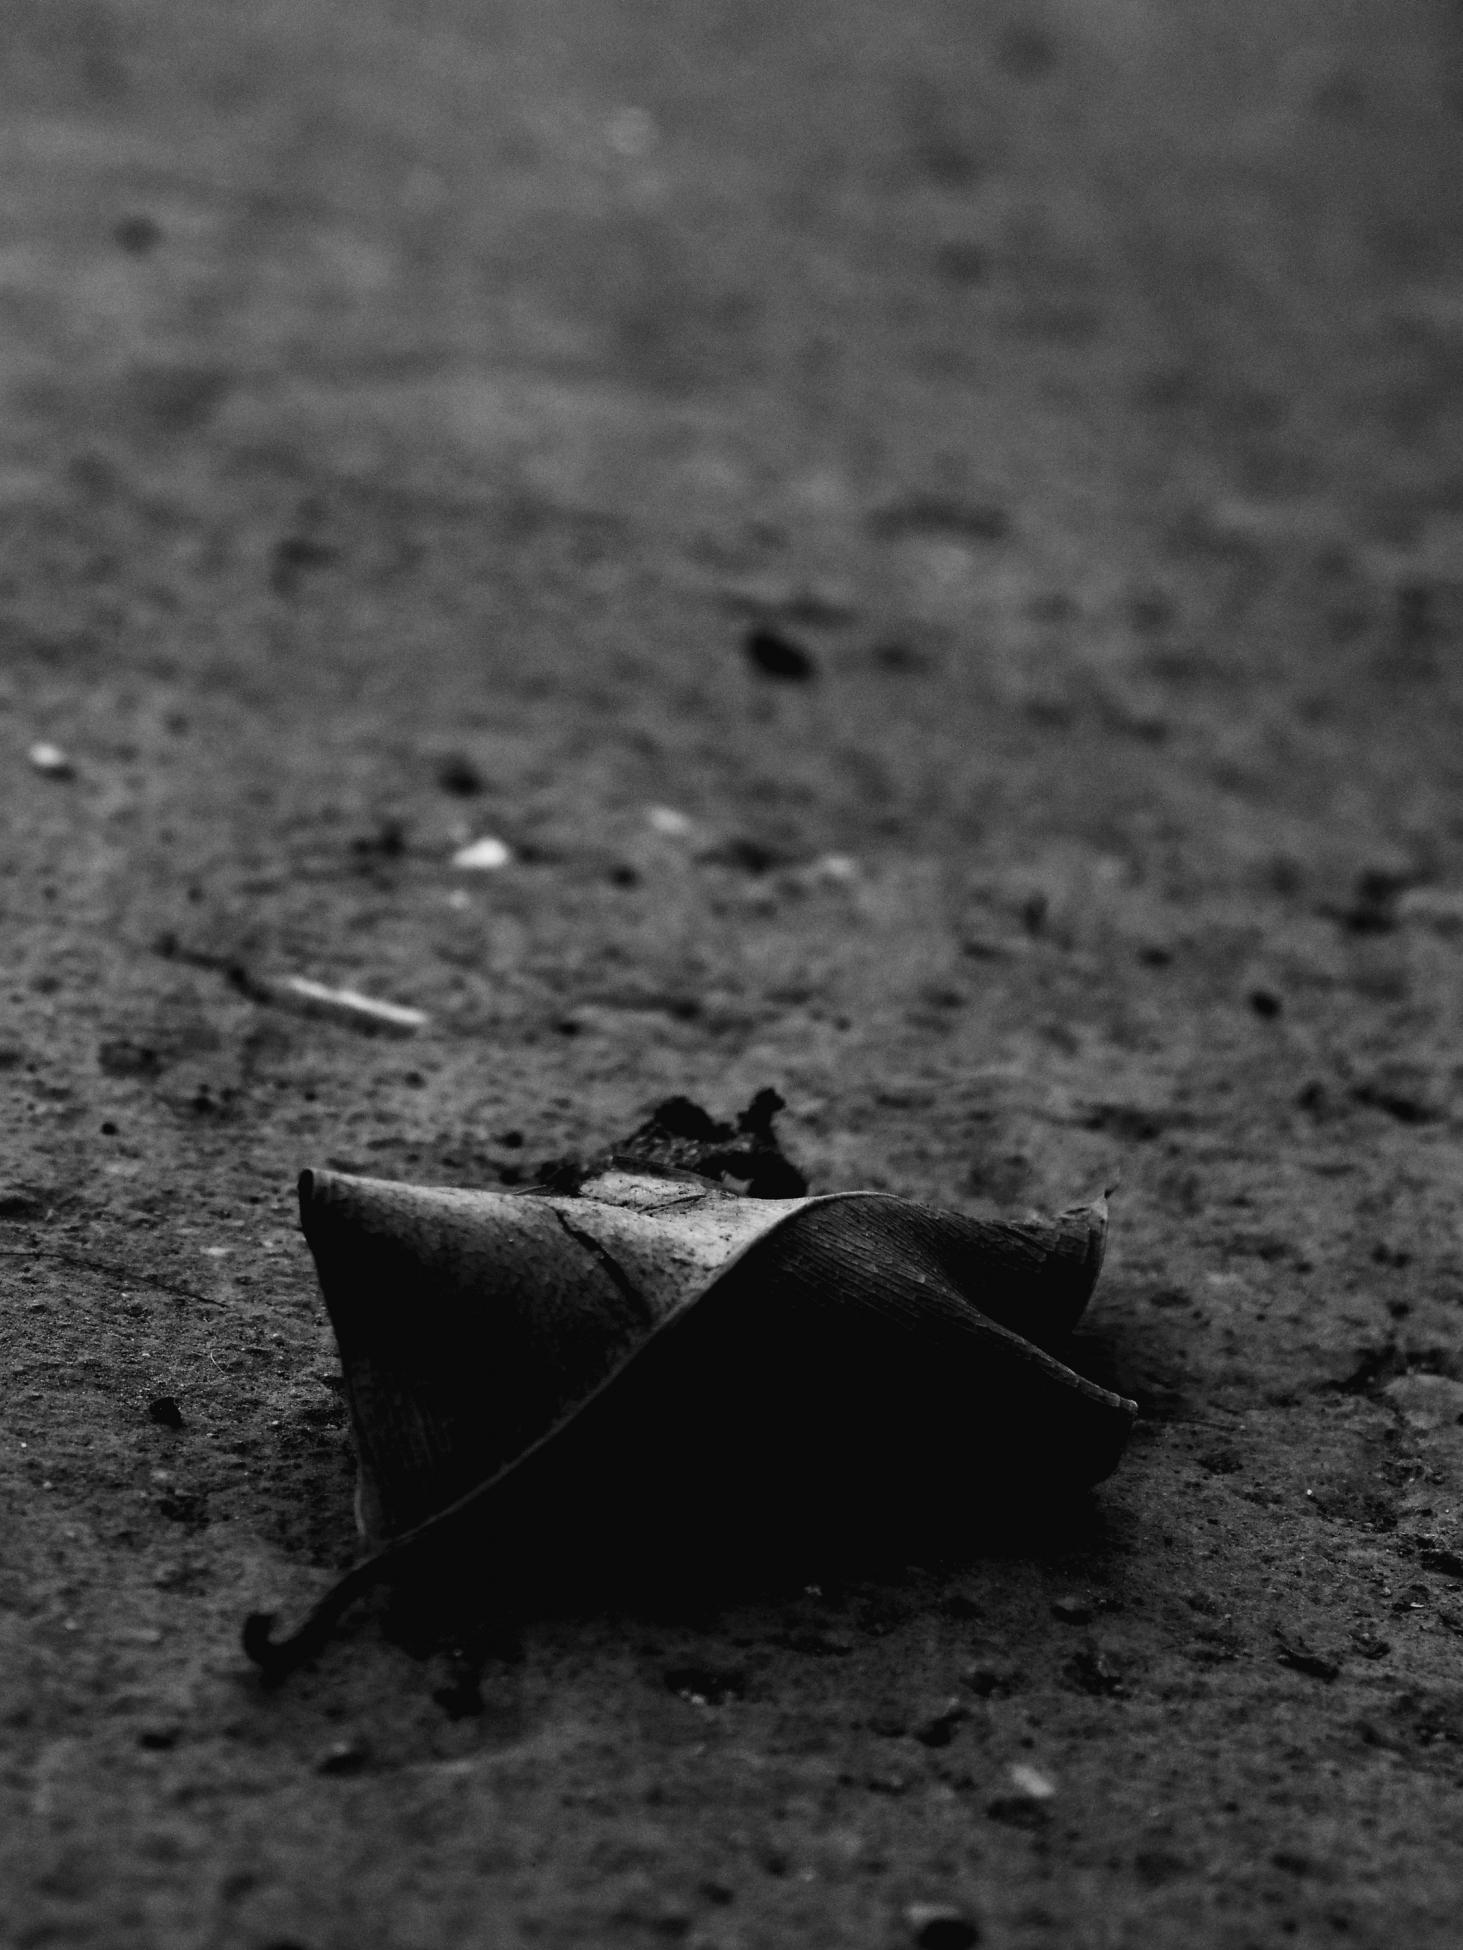 Remember the fallen (2017) - Carlos Rodolfo Escala Fernández